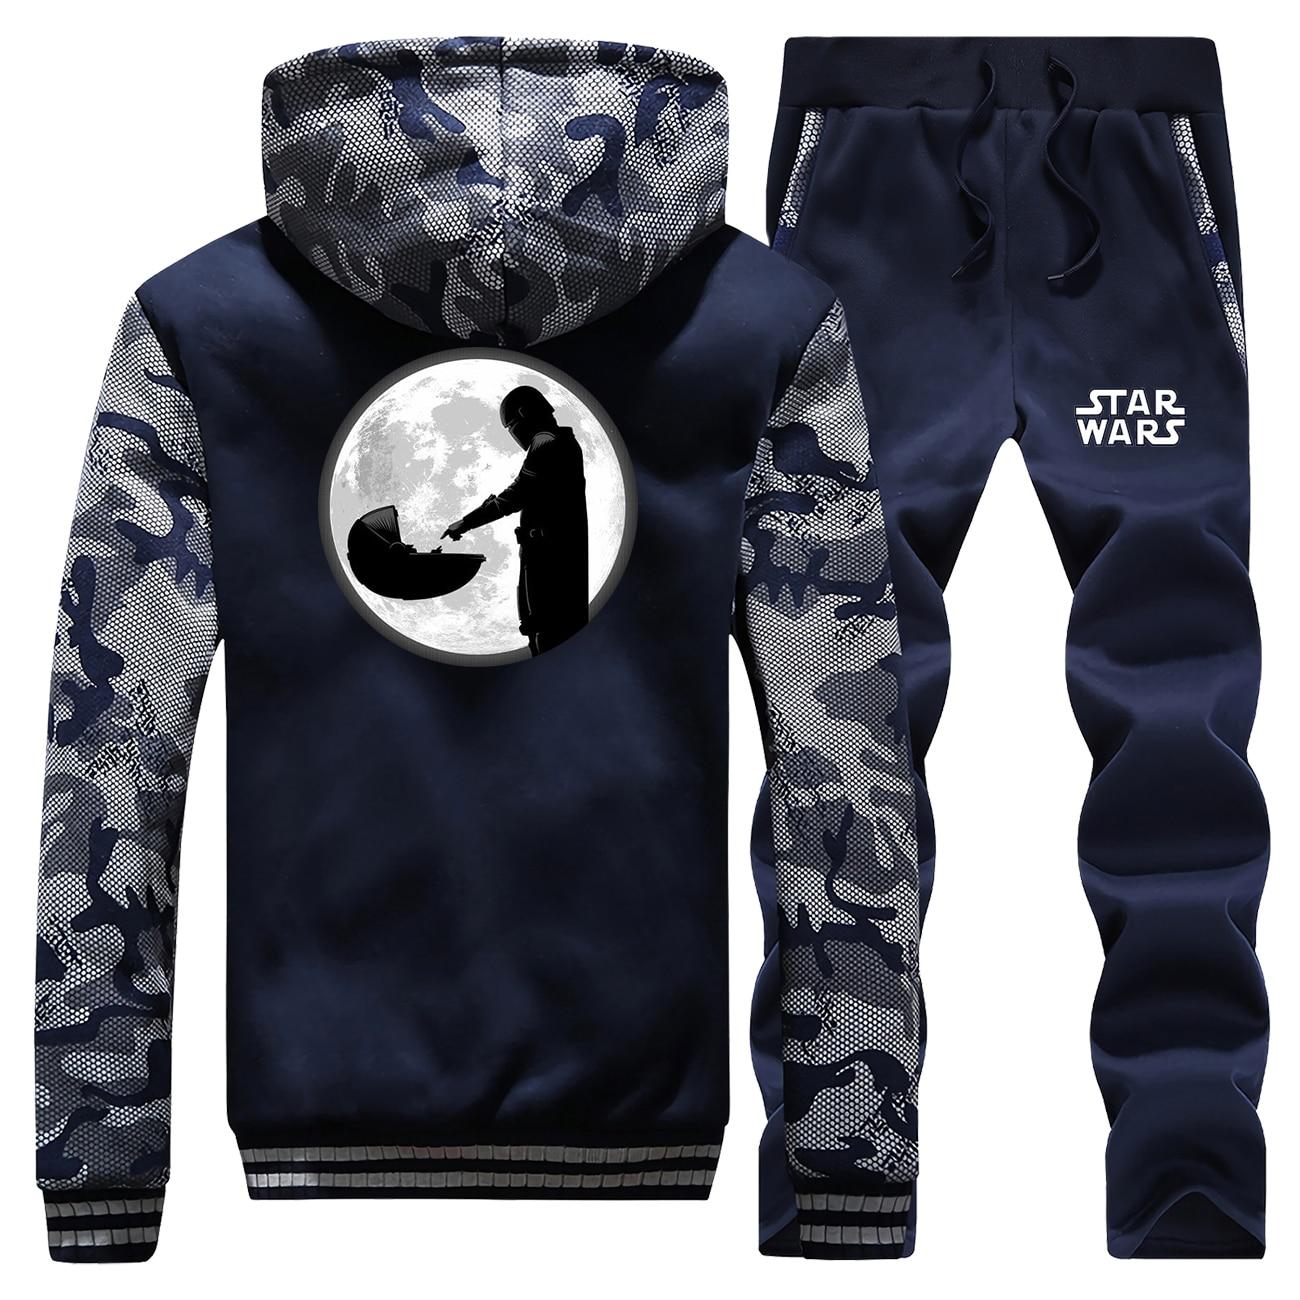 Baby Yoida Winter Camo 2Pcs Jacket Mandalorian Men Fleece Thick Warm Mens Jackets Coats Star Wars Hoodies Pants Sets Sportswear